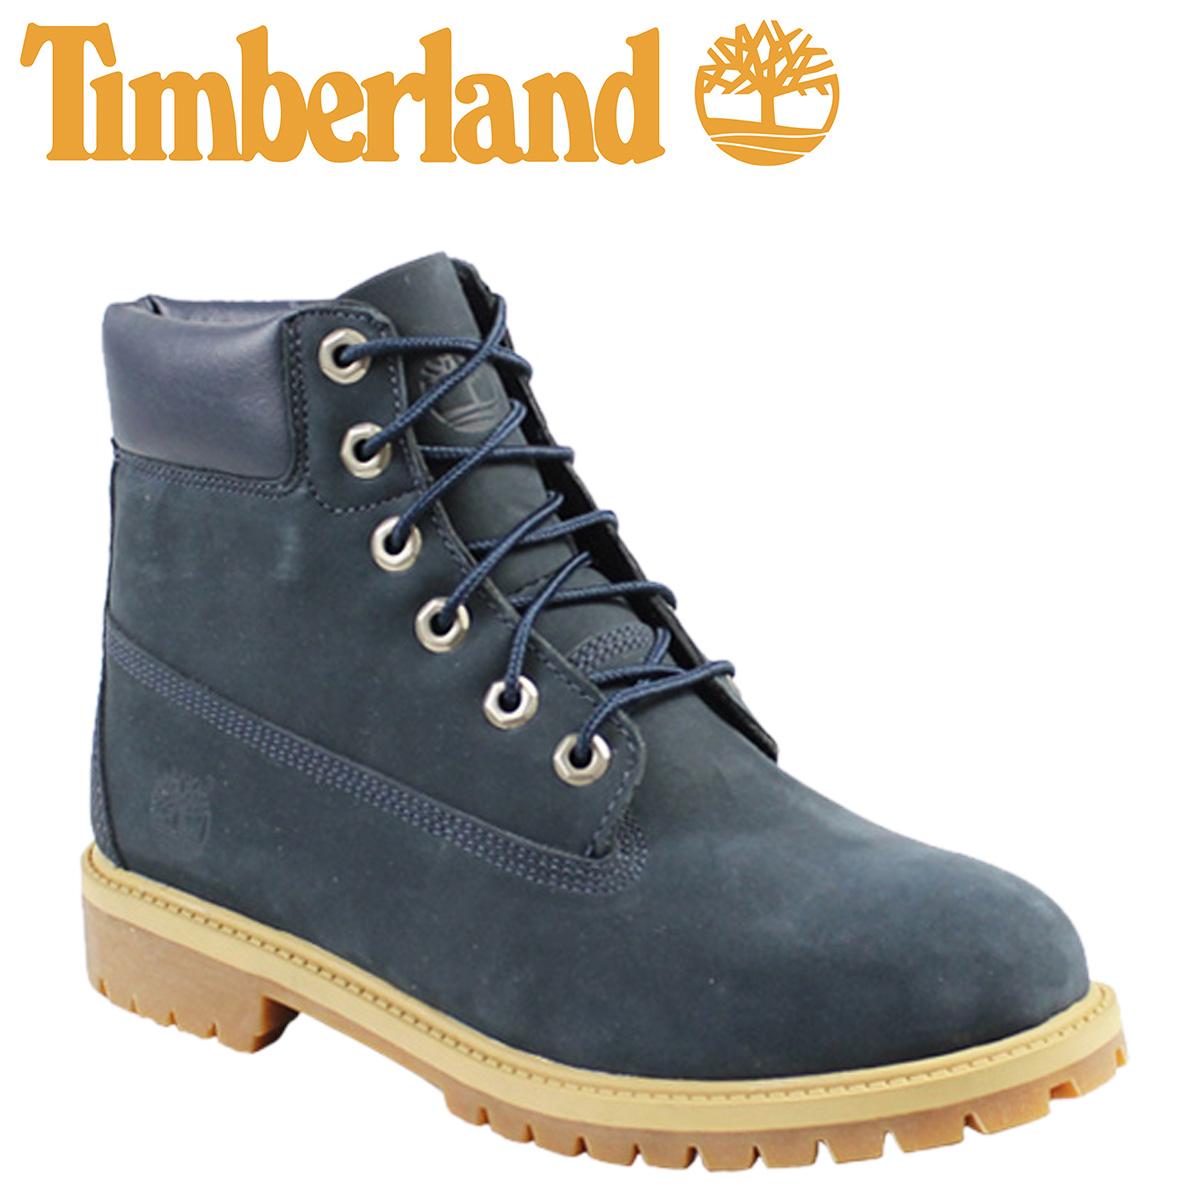 0a6023cd9cb ALLSPORTS: Women's Timberland Timberland 6 inch premium waterproof ...